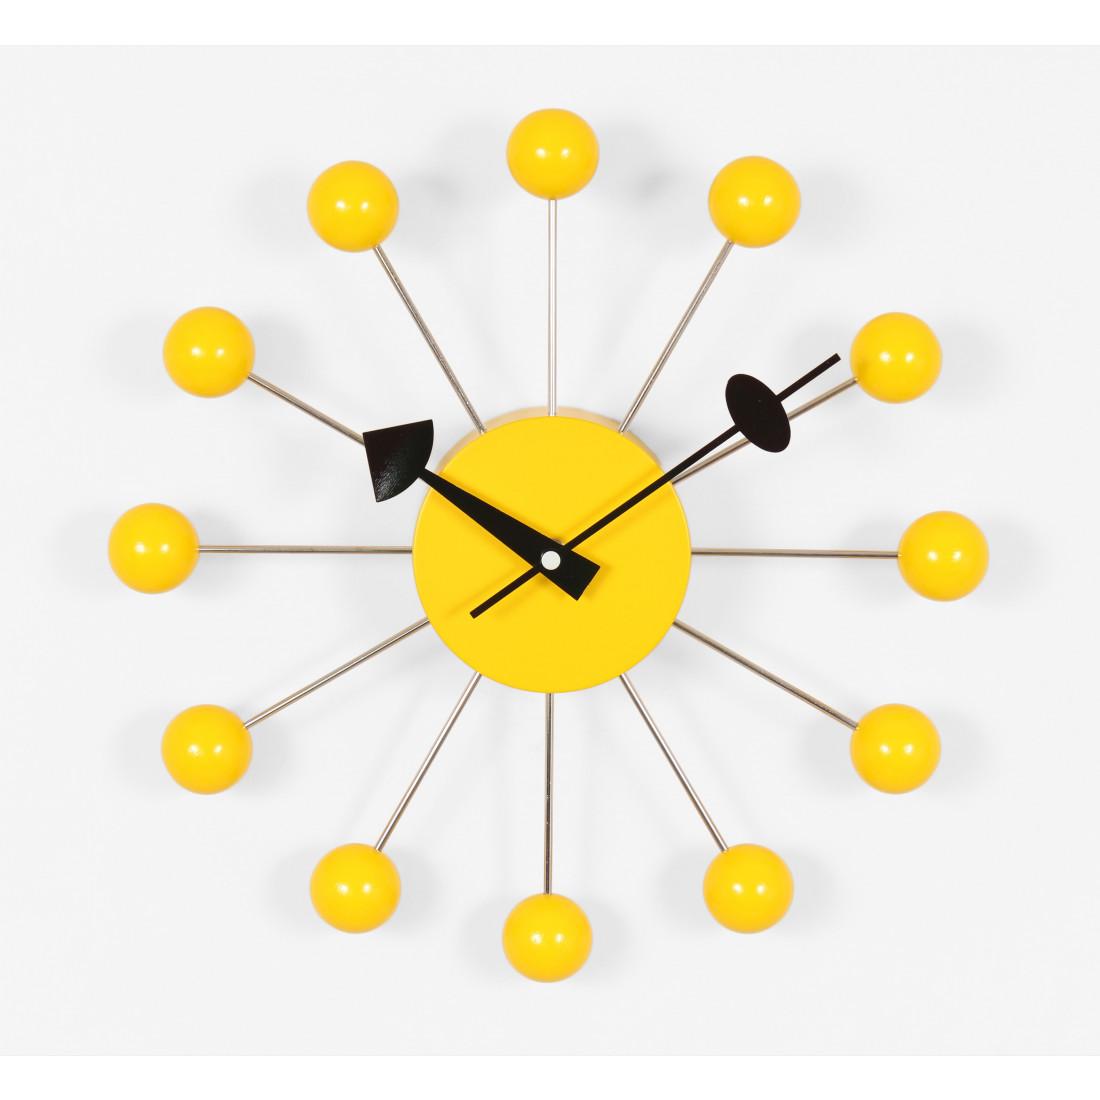 6 clock.jpg